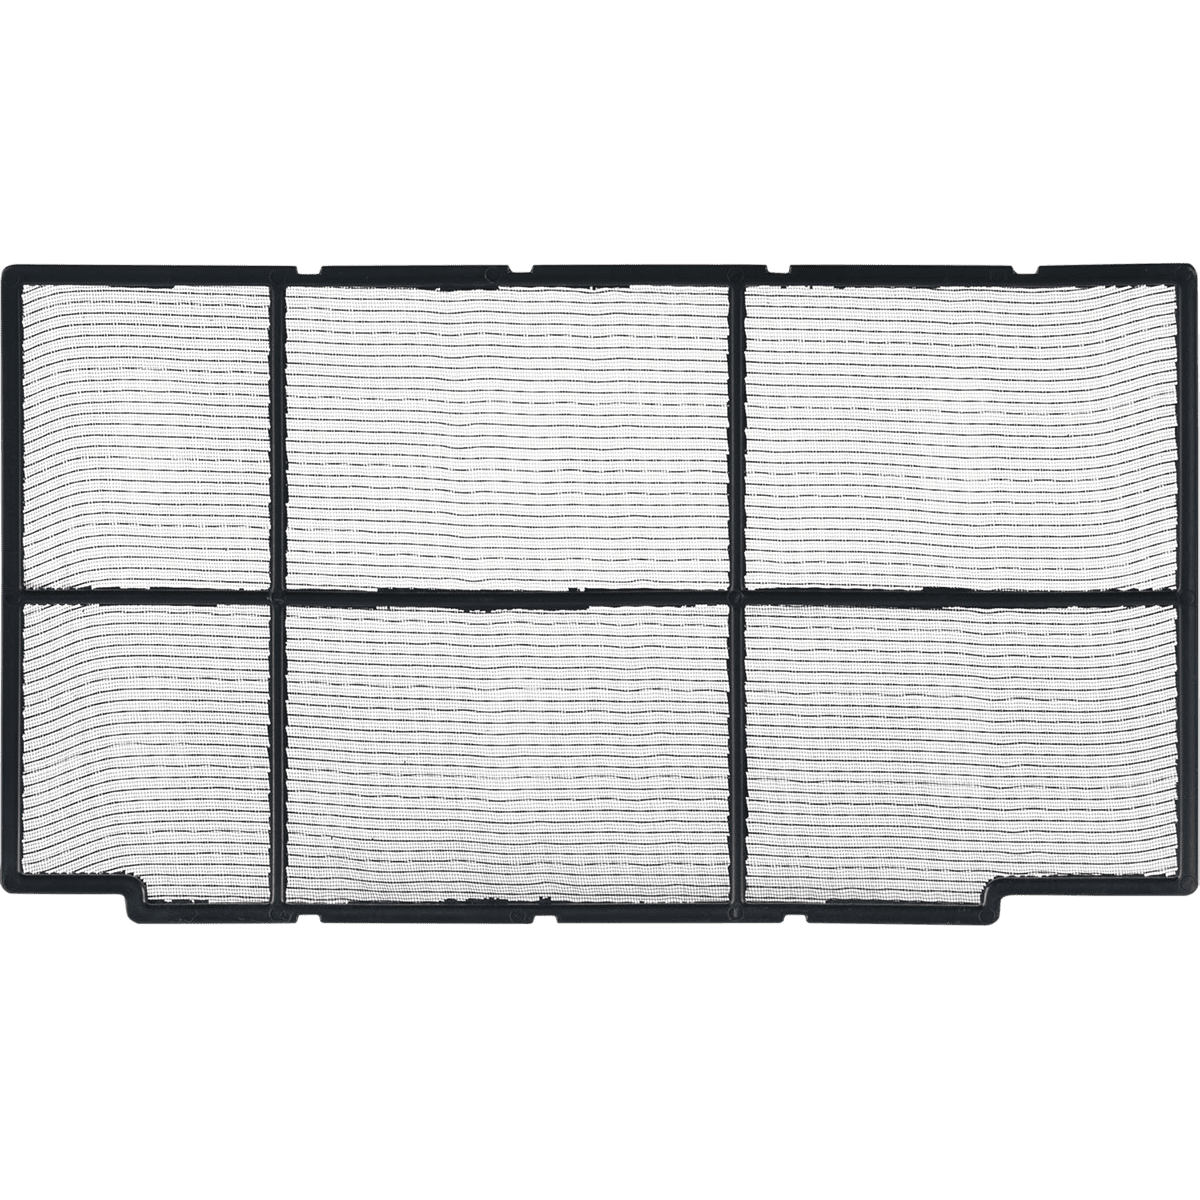 Frigidaire FFRA1011R1 115 V 10000 BTU Window Air Conditioner Sylvane